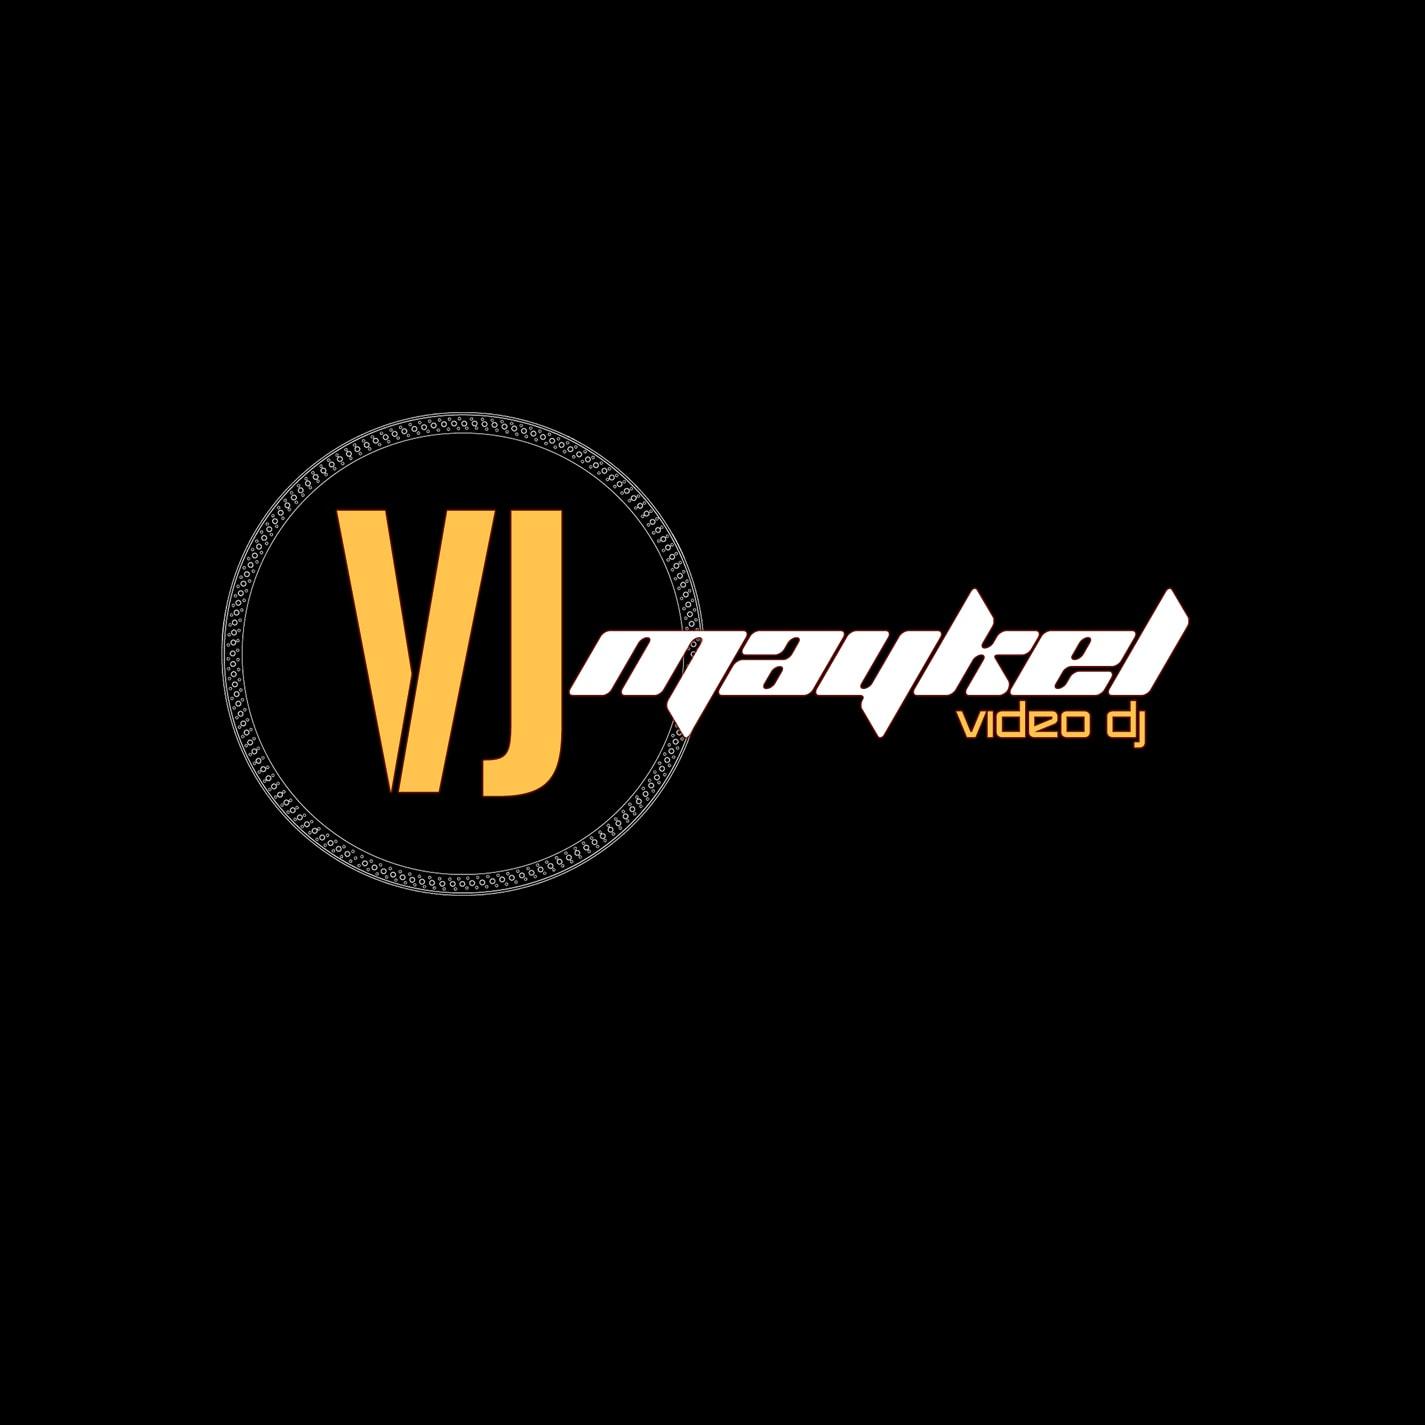 vjmaykel-logo-design-accolademedia